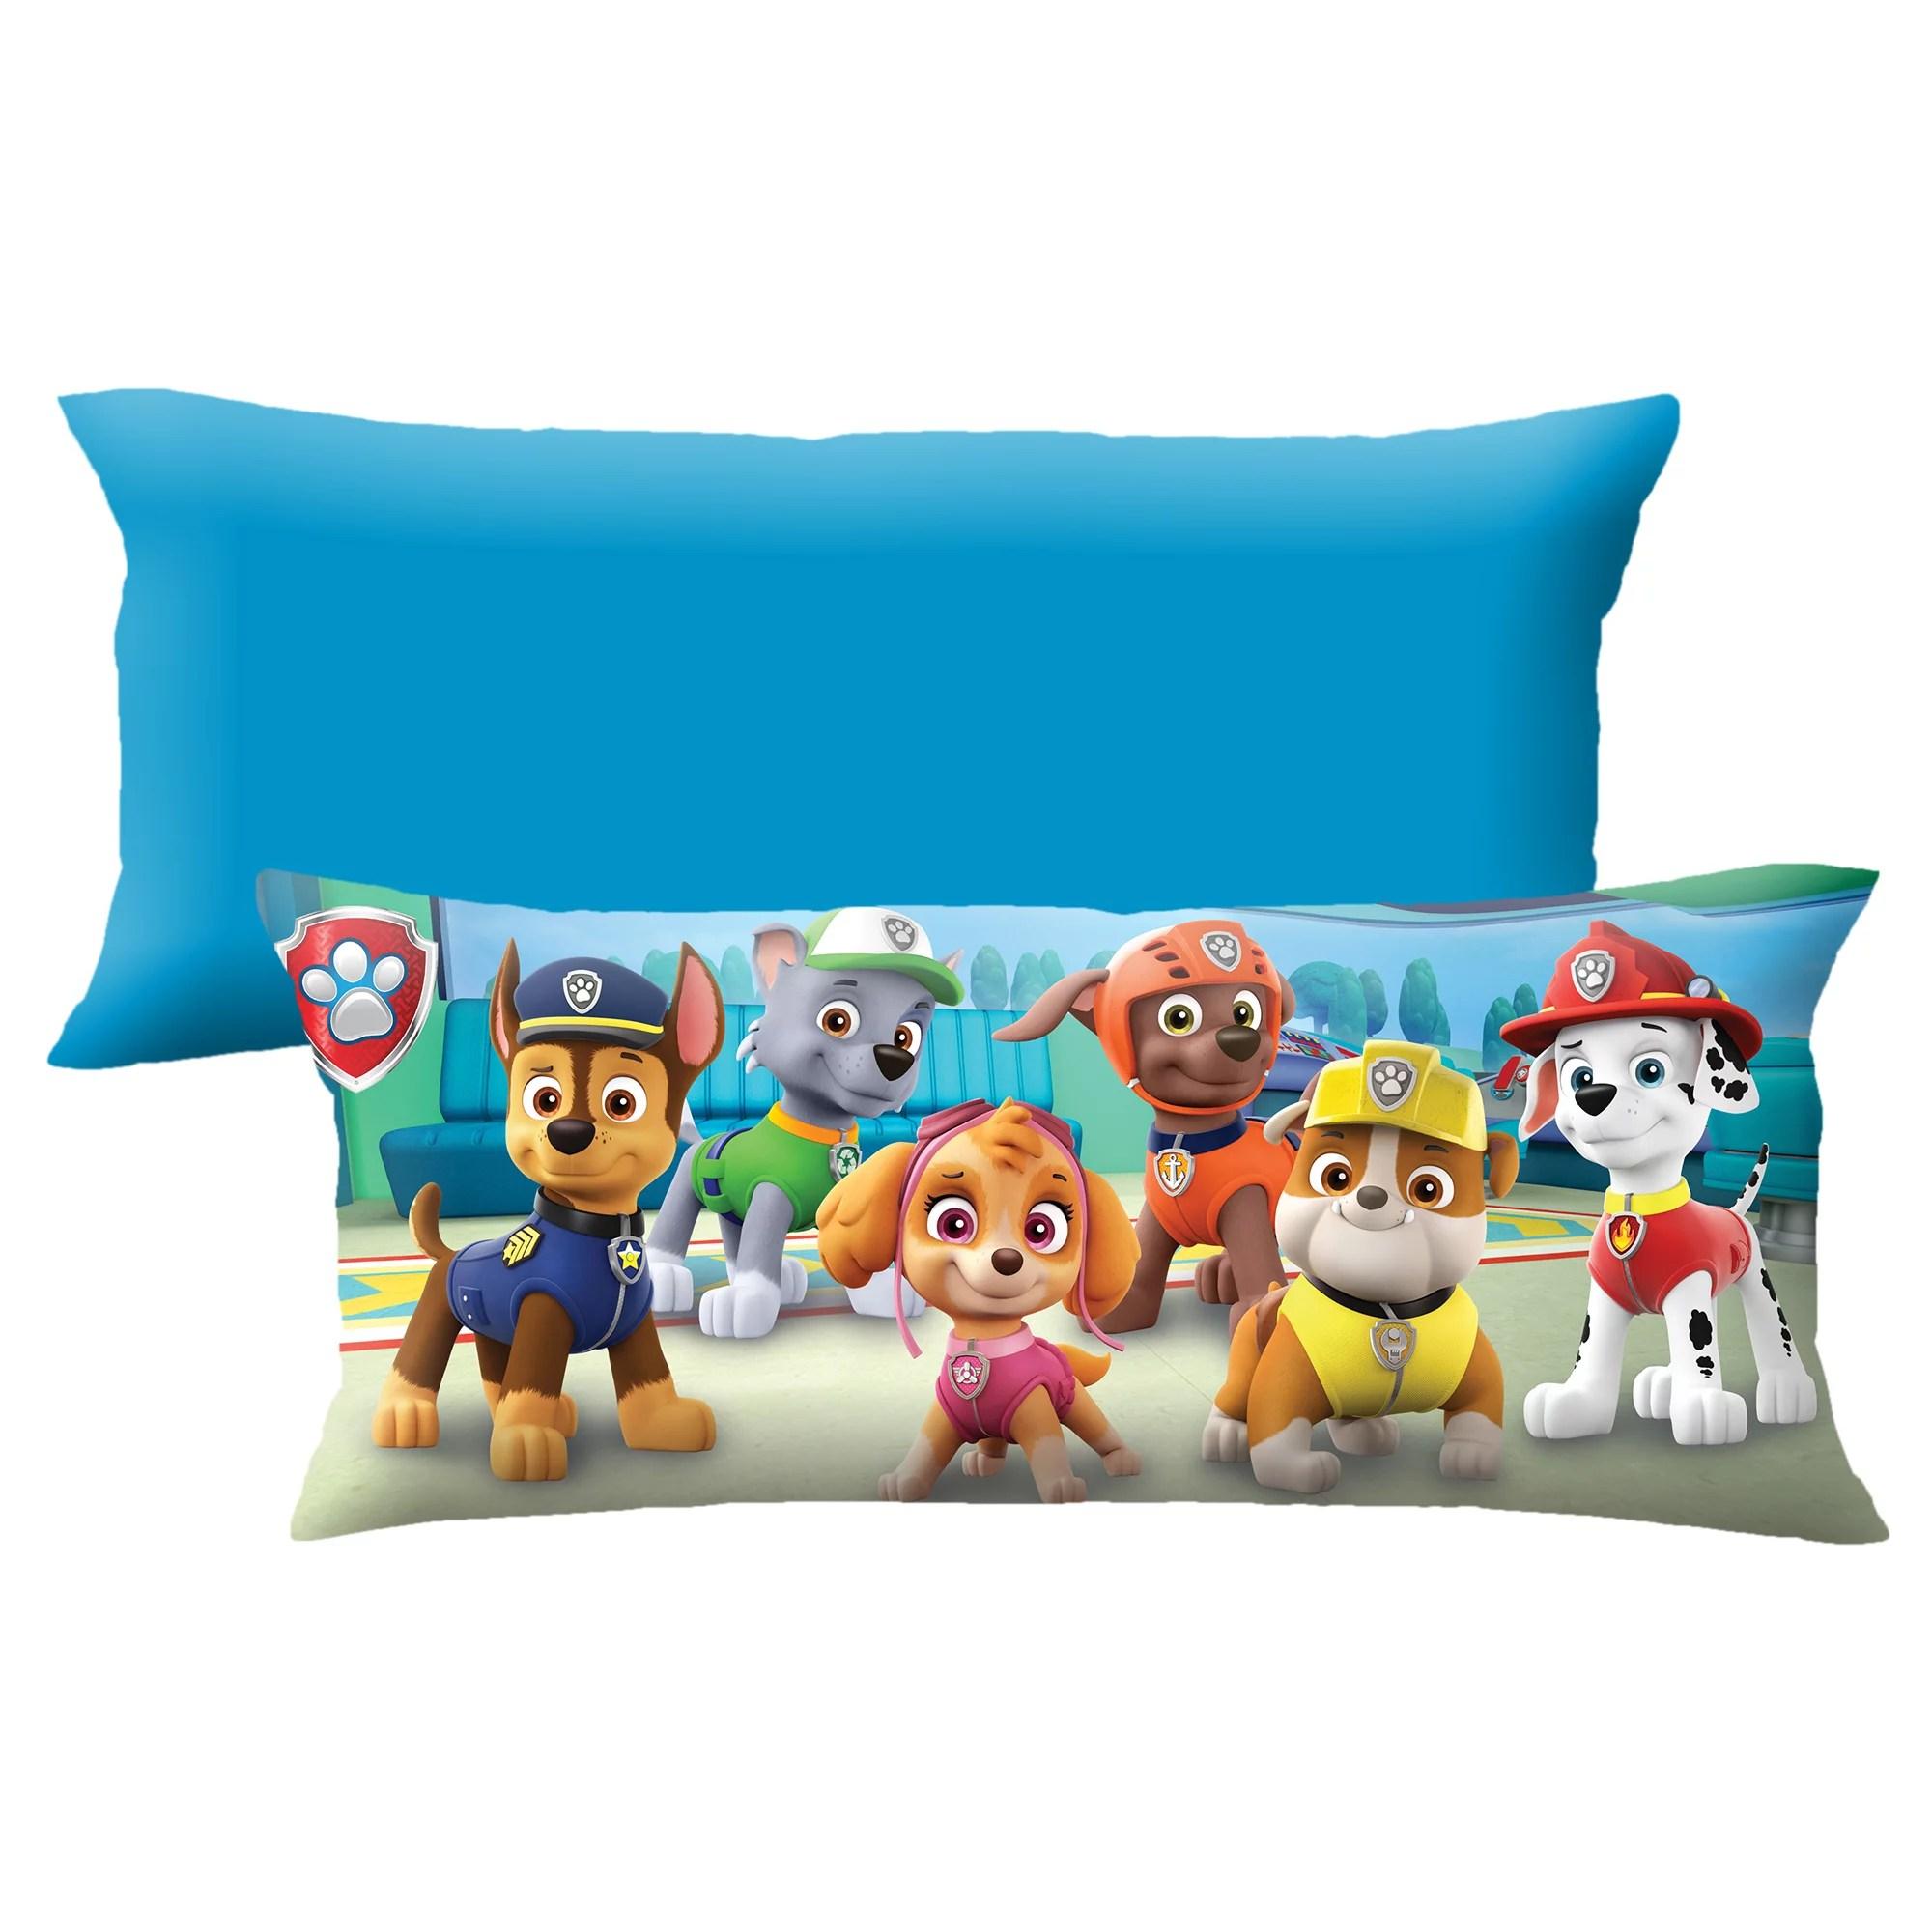 paw patrol extra large body pillow soft plush microfiber 4 feet long walmart com